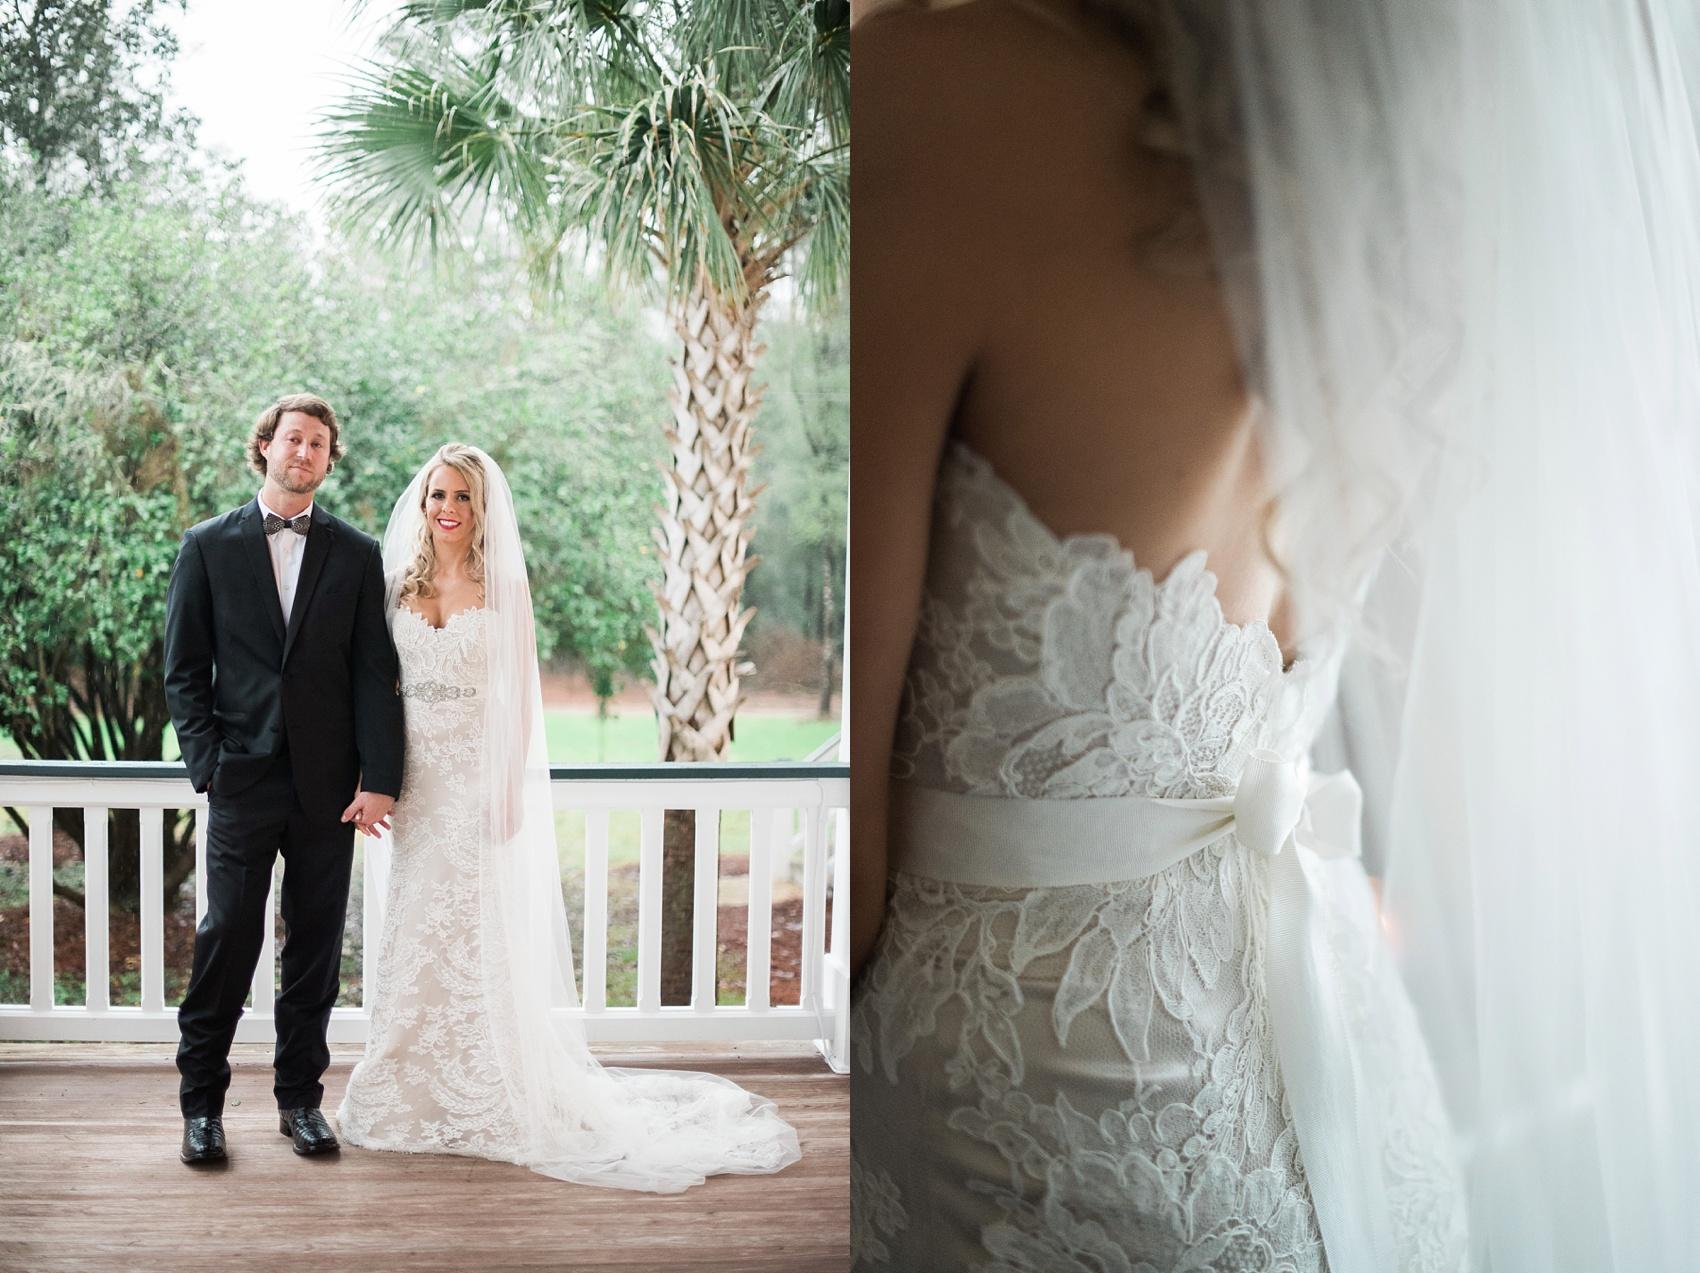 South_carolina_wedding_photographer_0043.jpg